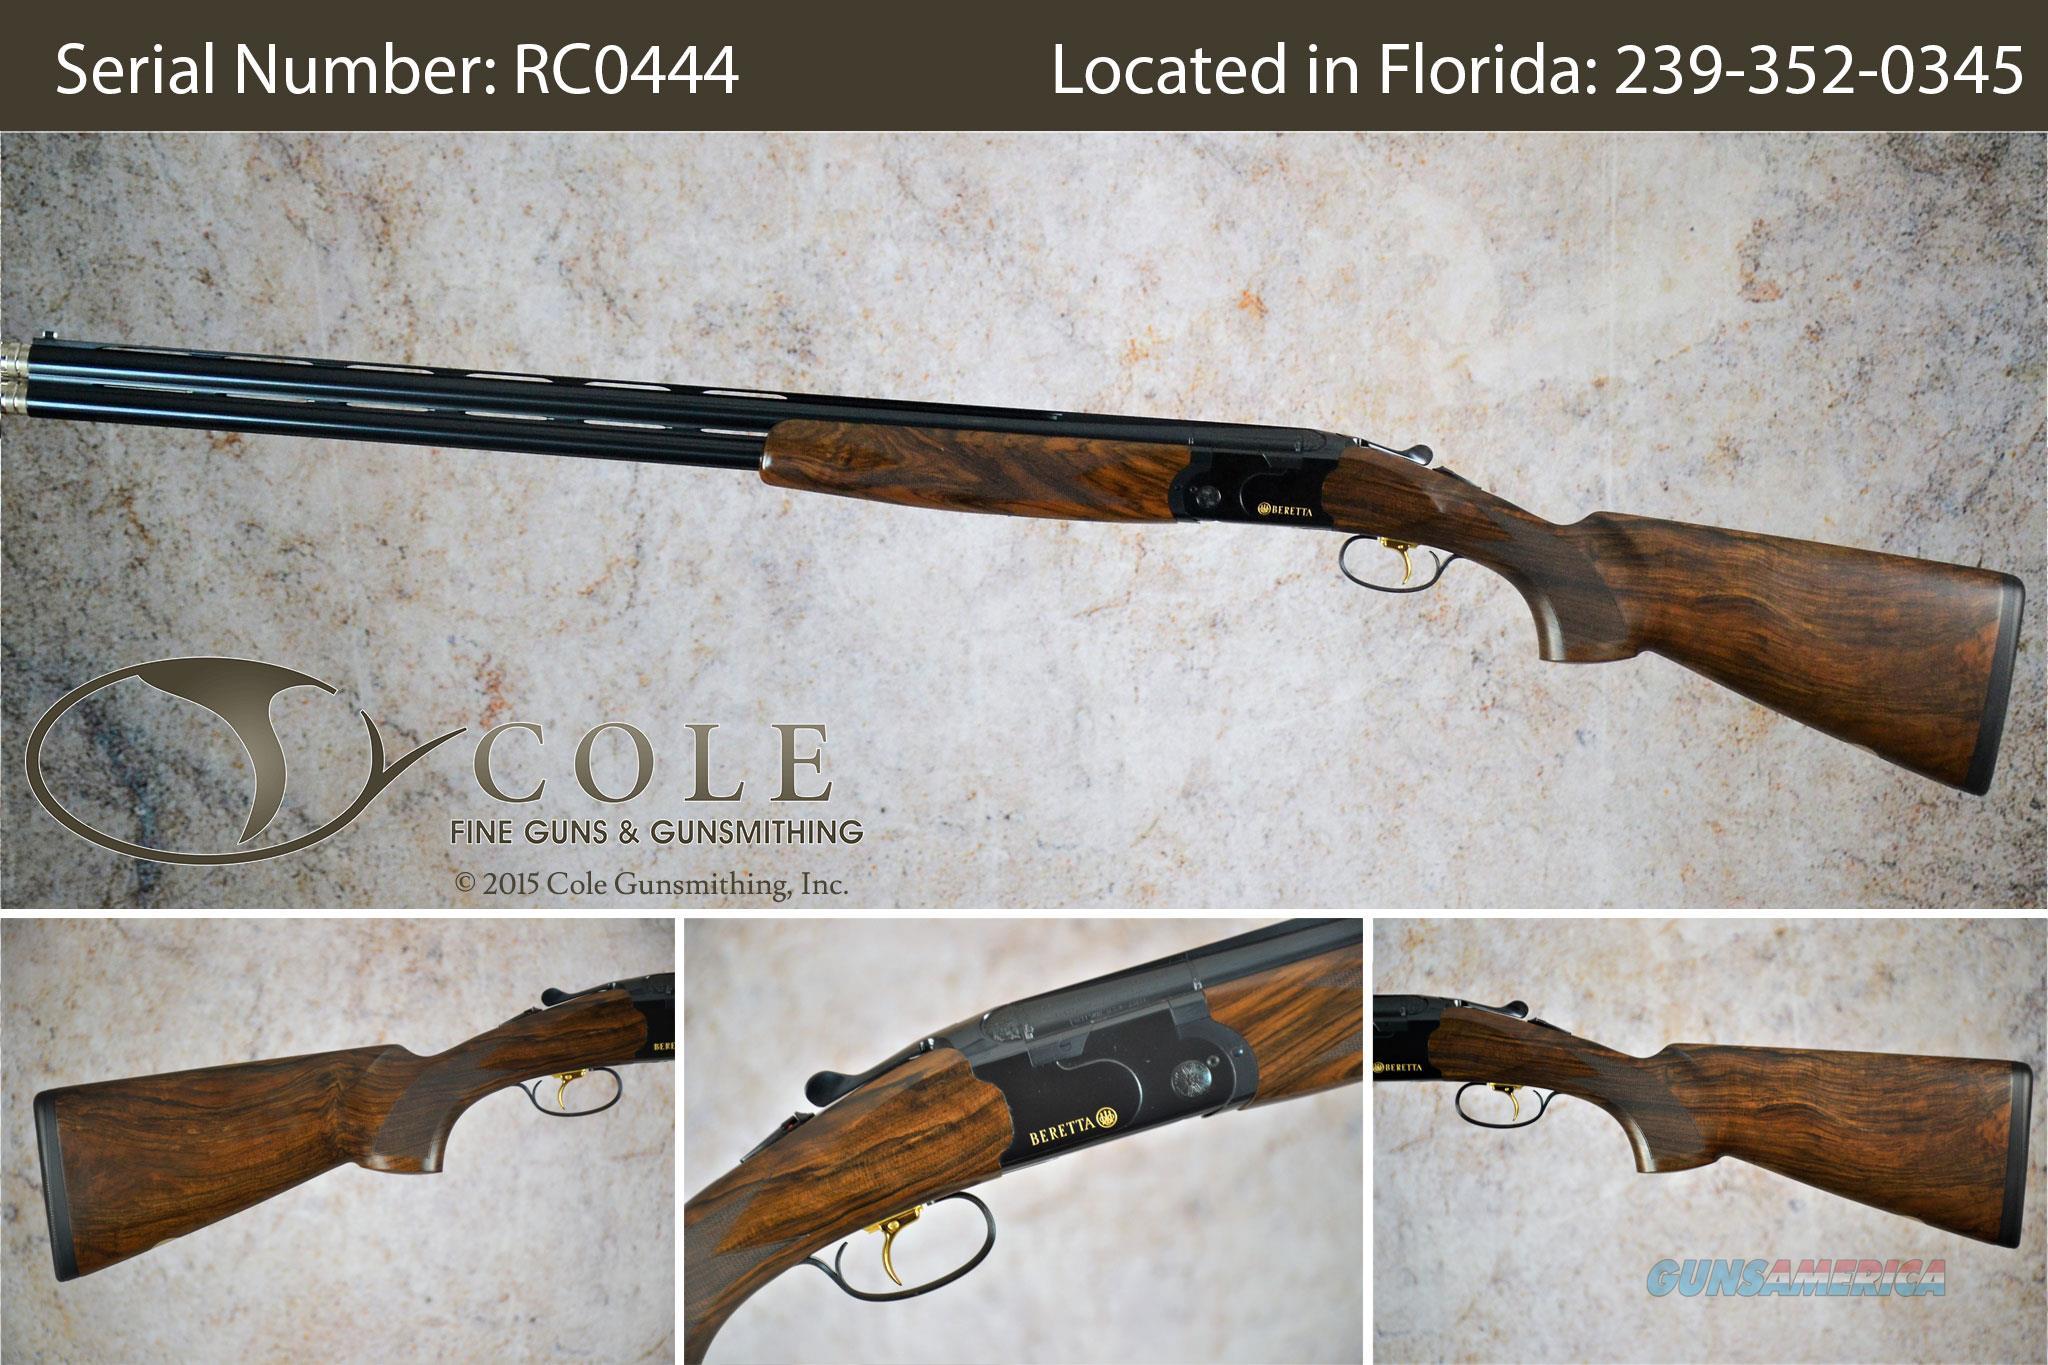 "Beretta 686 Cole Special Sporting 12g 30"" SN:#RC0444  Guns > Shotguns > Beretta Shotguns > O/U > Trap/Skeet"